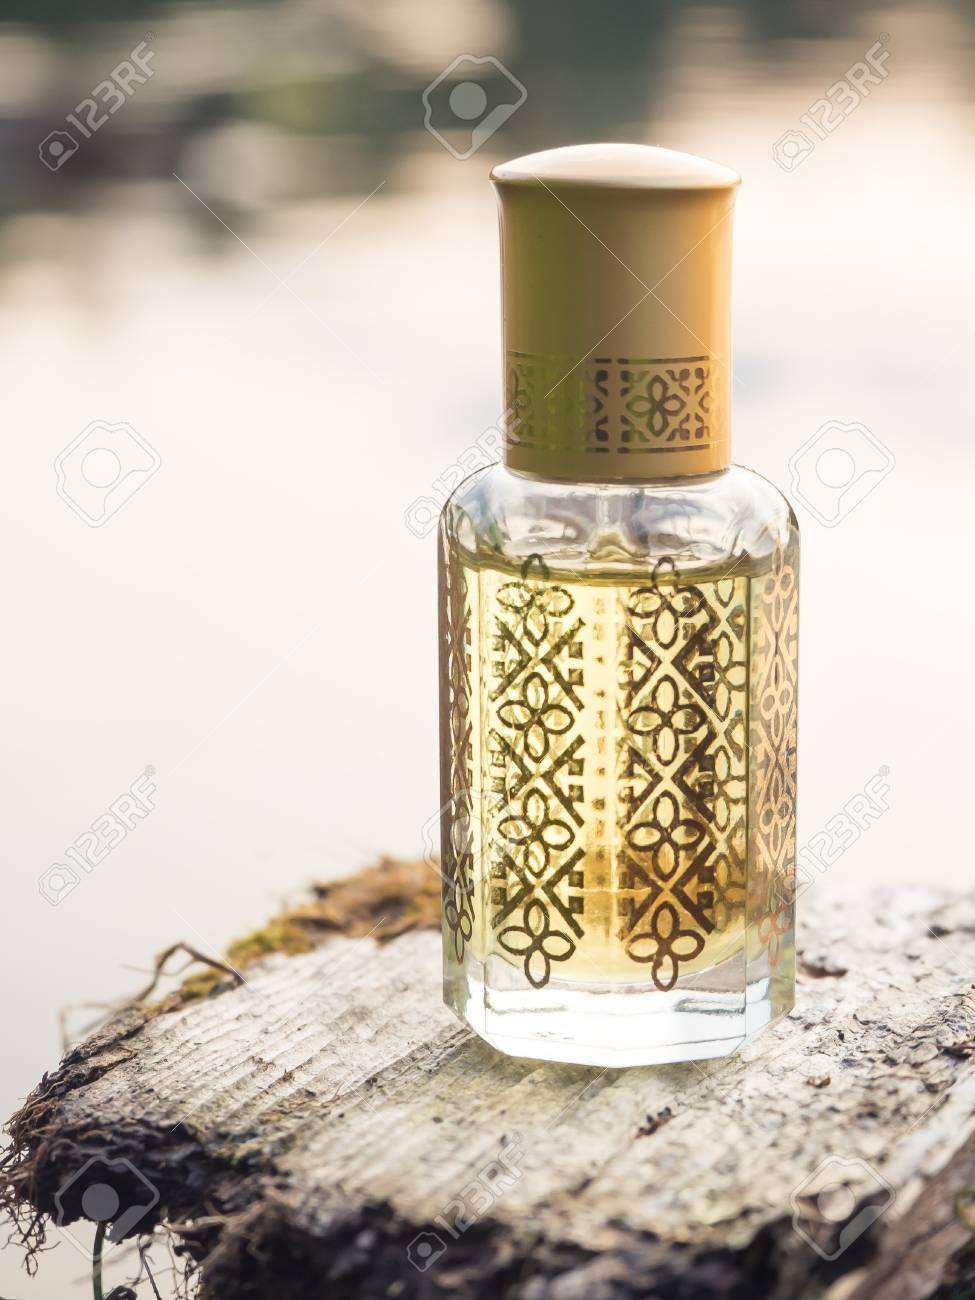 Arabian oud attar or agarwood oil fragrances in mini bottle